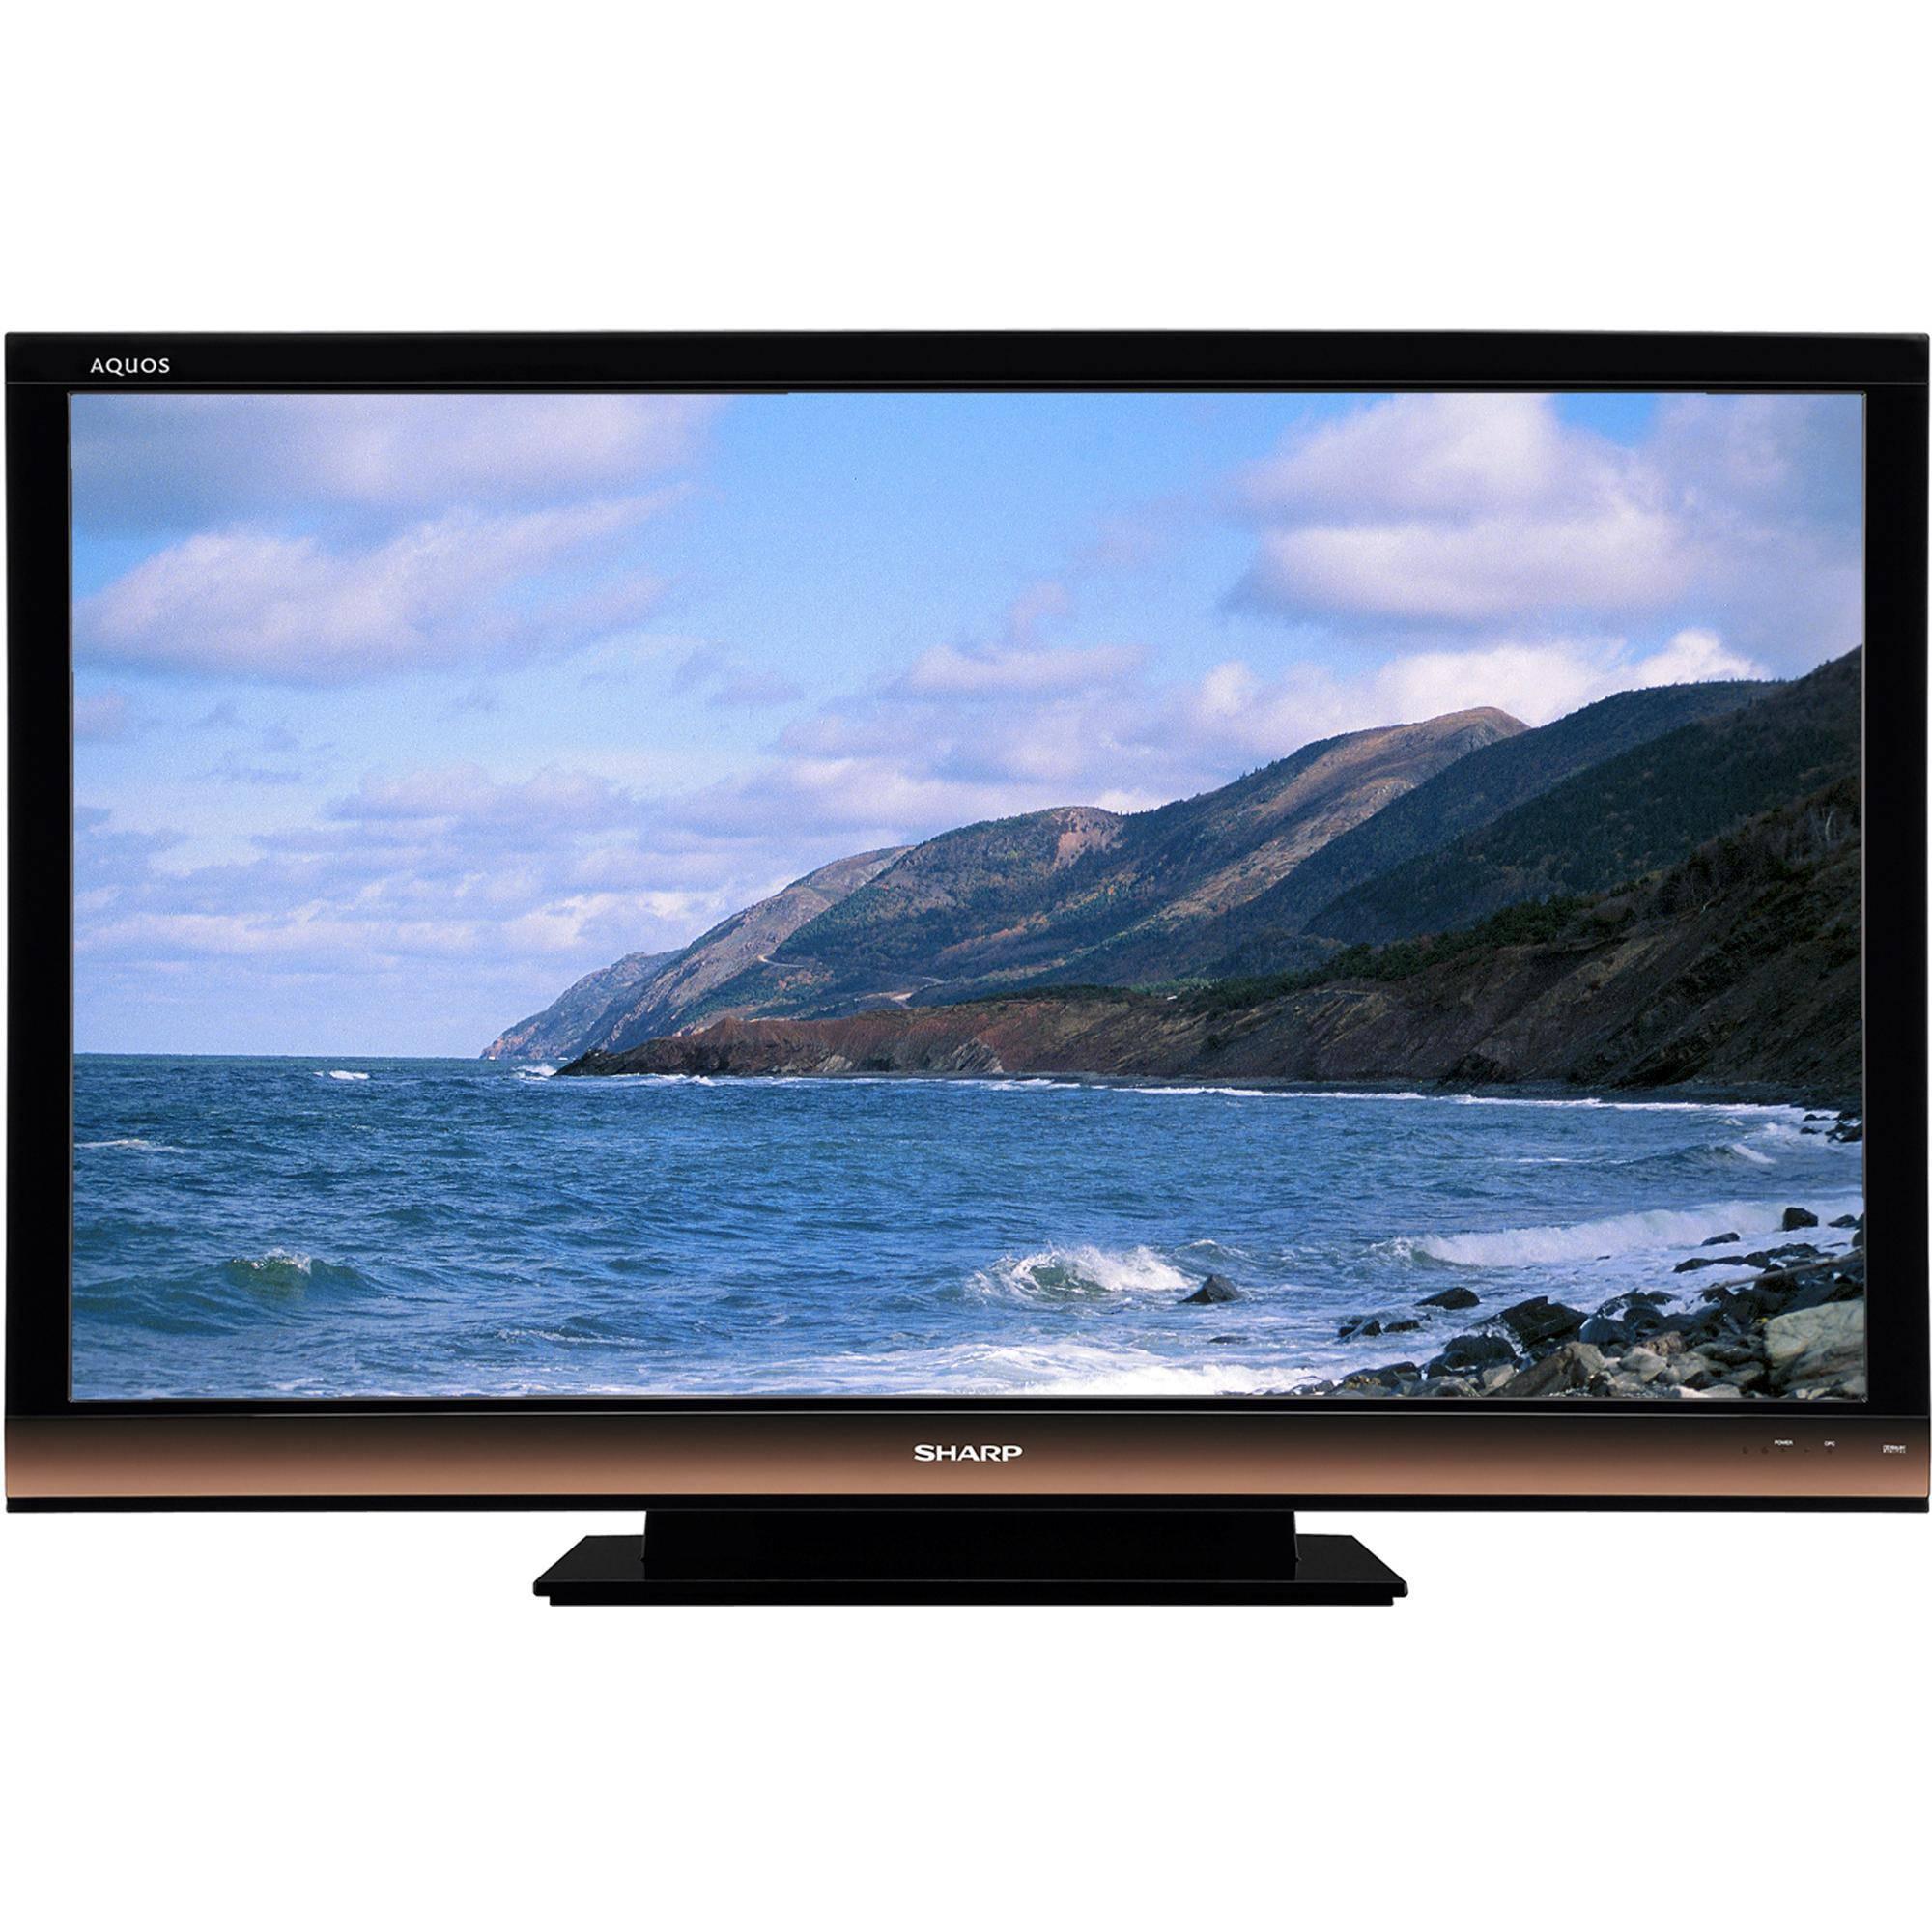 Sharp LC 60E77UN 60 AQUOS LCD TV